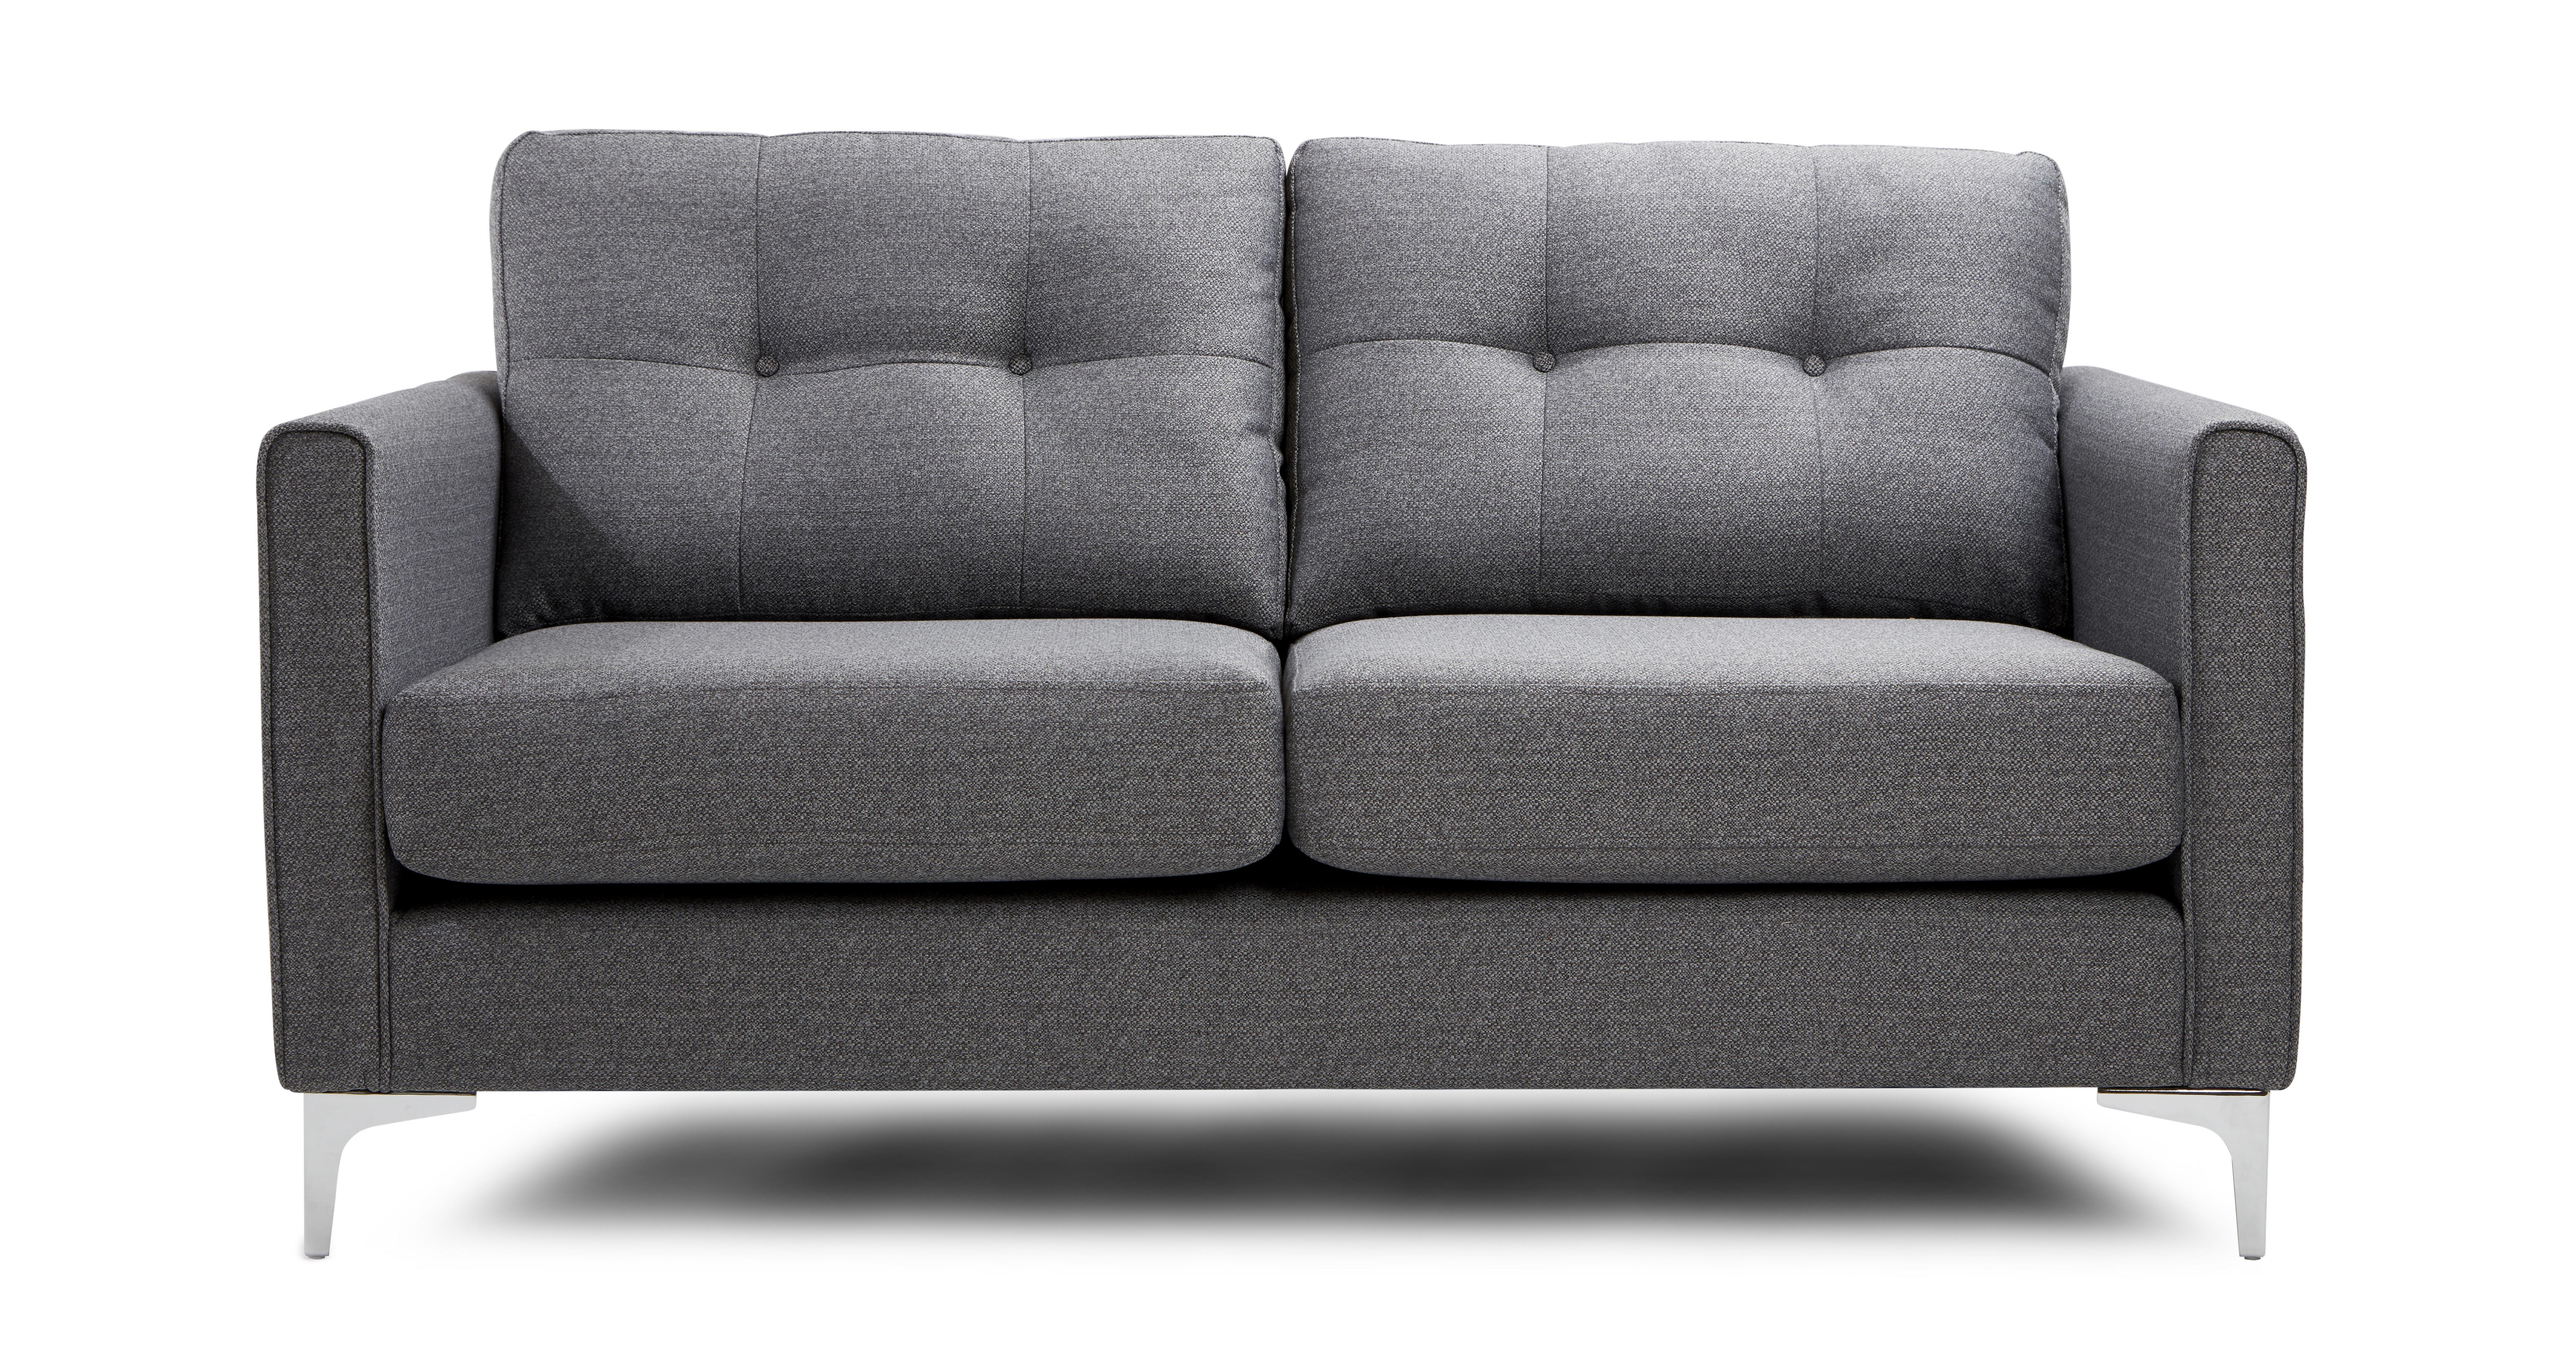 Bask Sofa Textured Weave